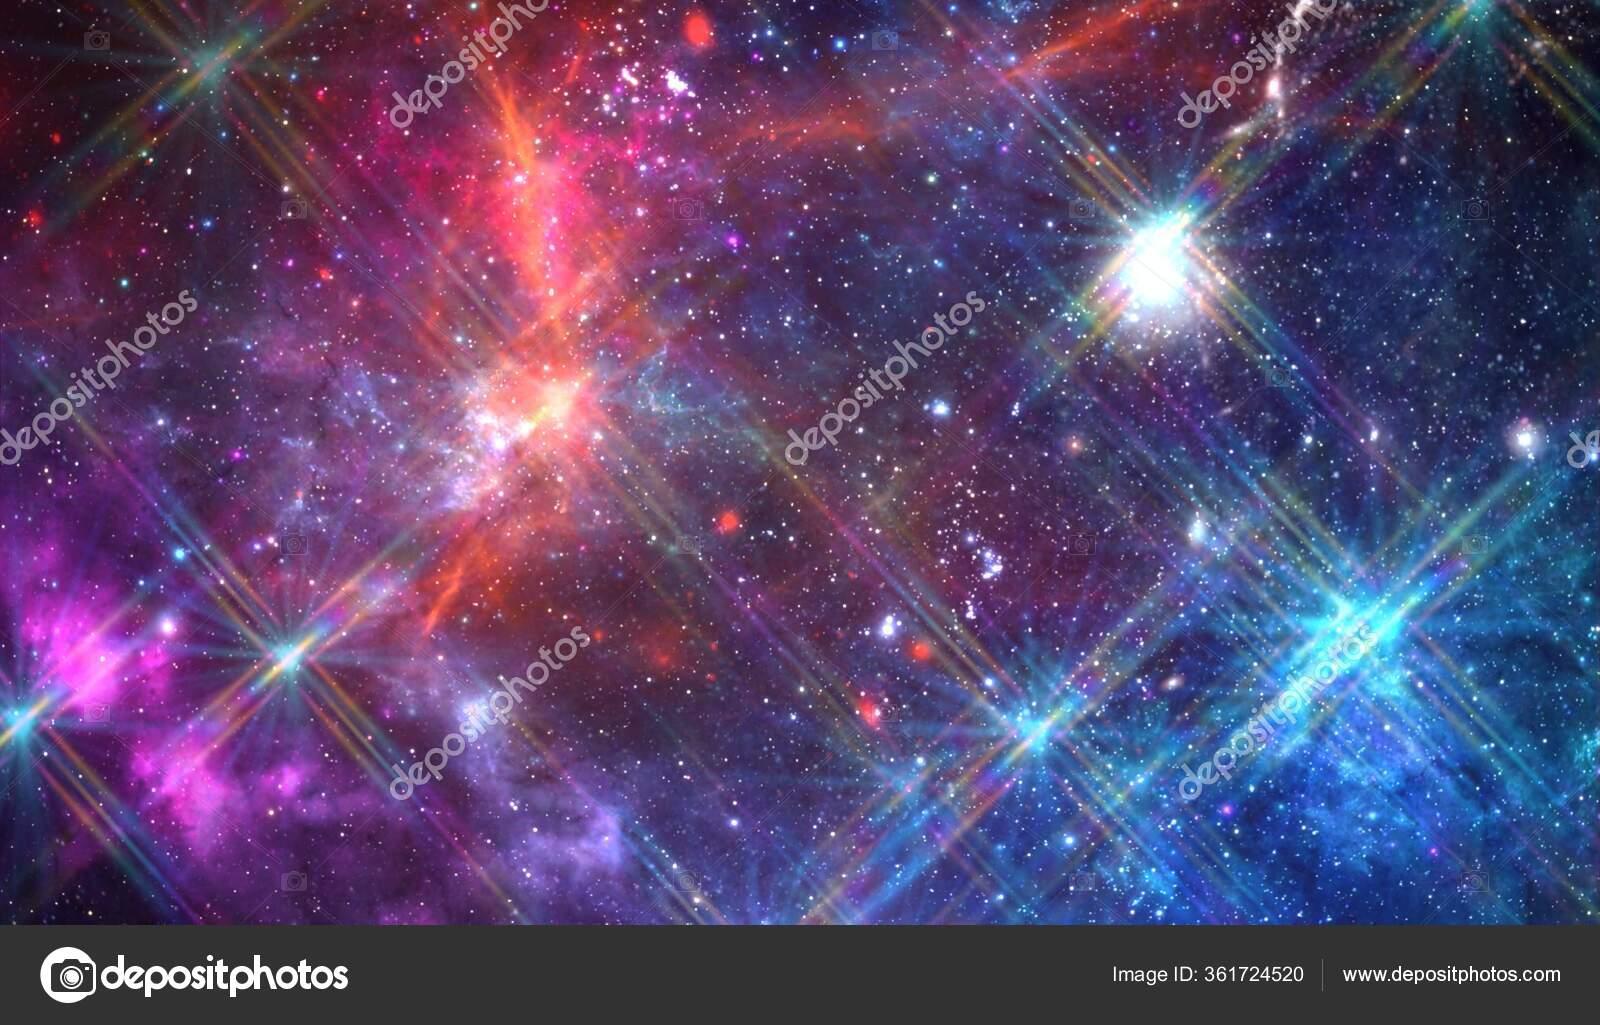 depositphotos 361724520 stock photo black hole planets galaxy science